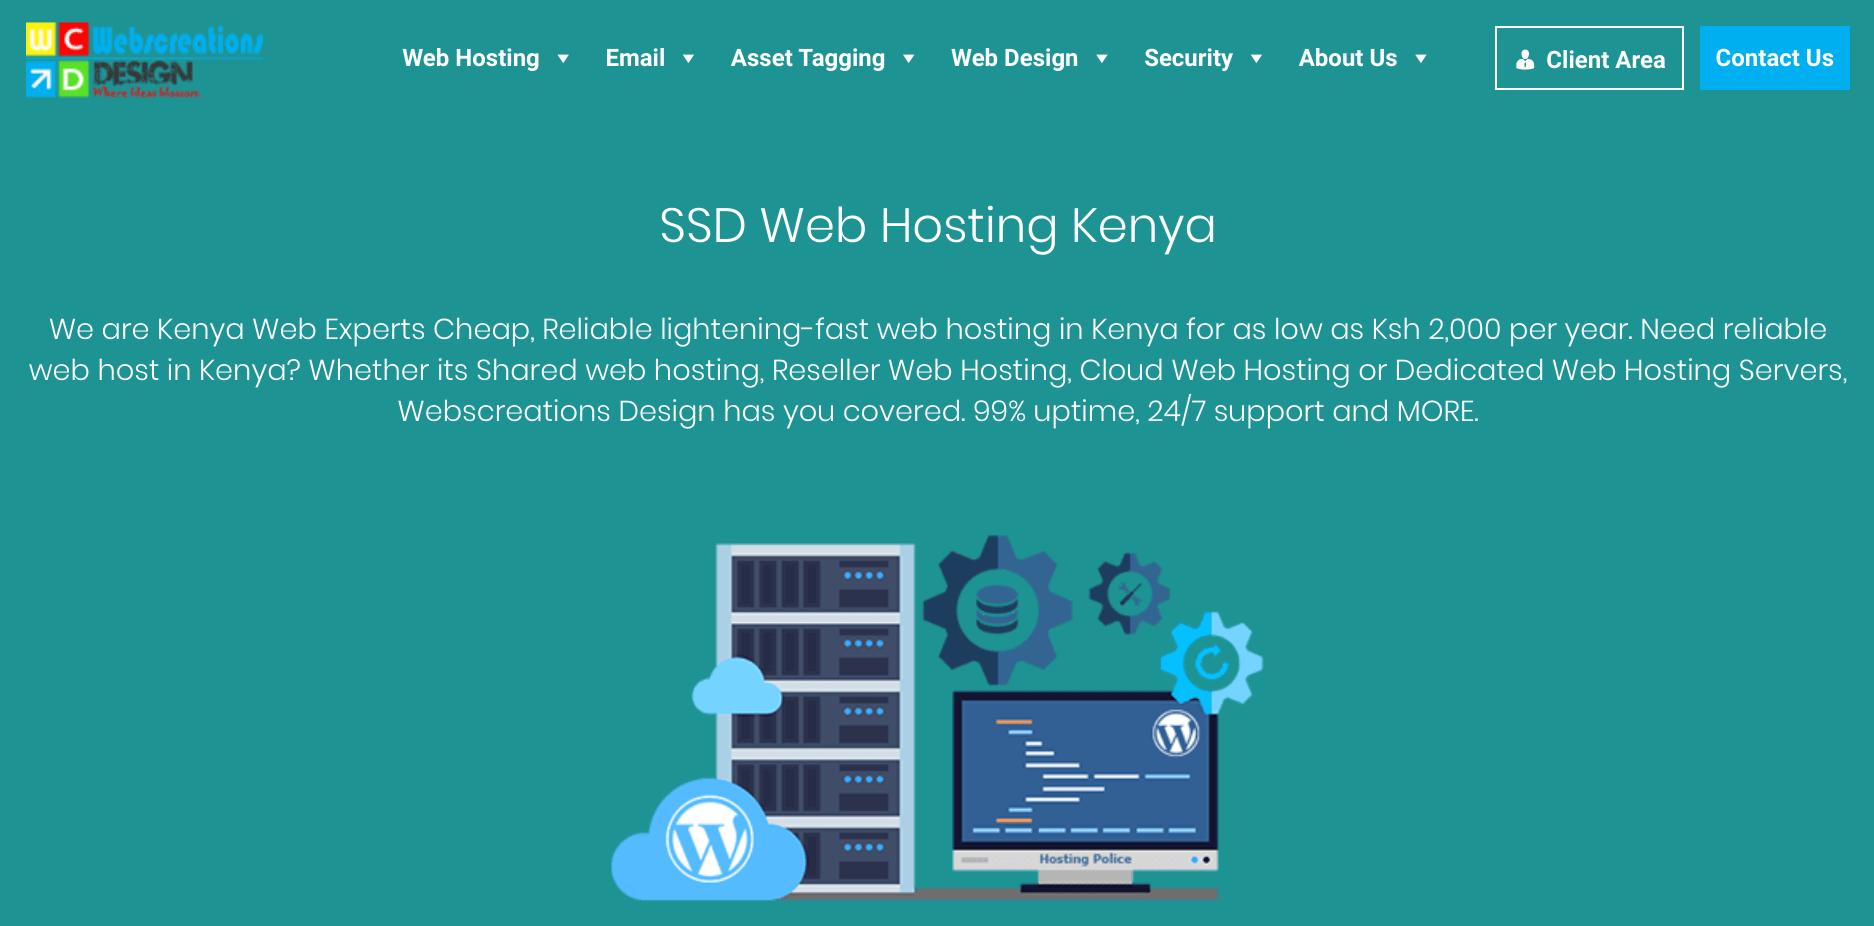 Webscreations Design